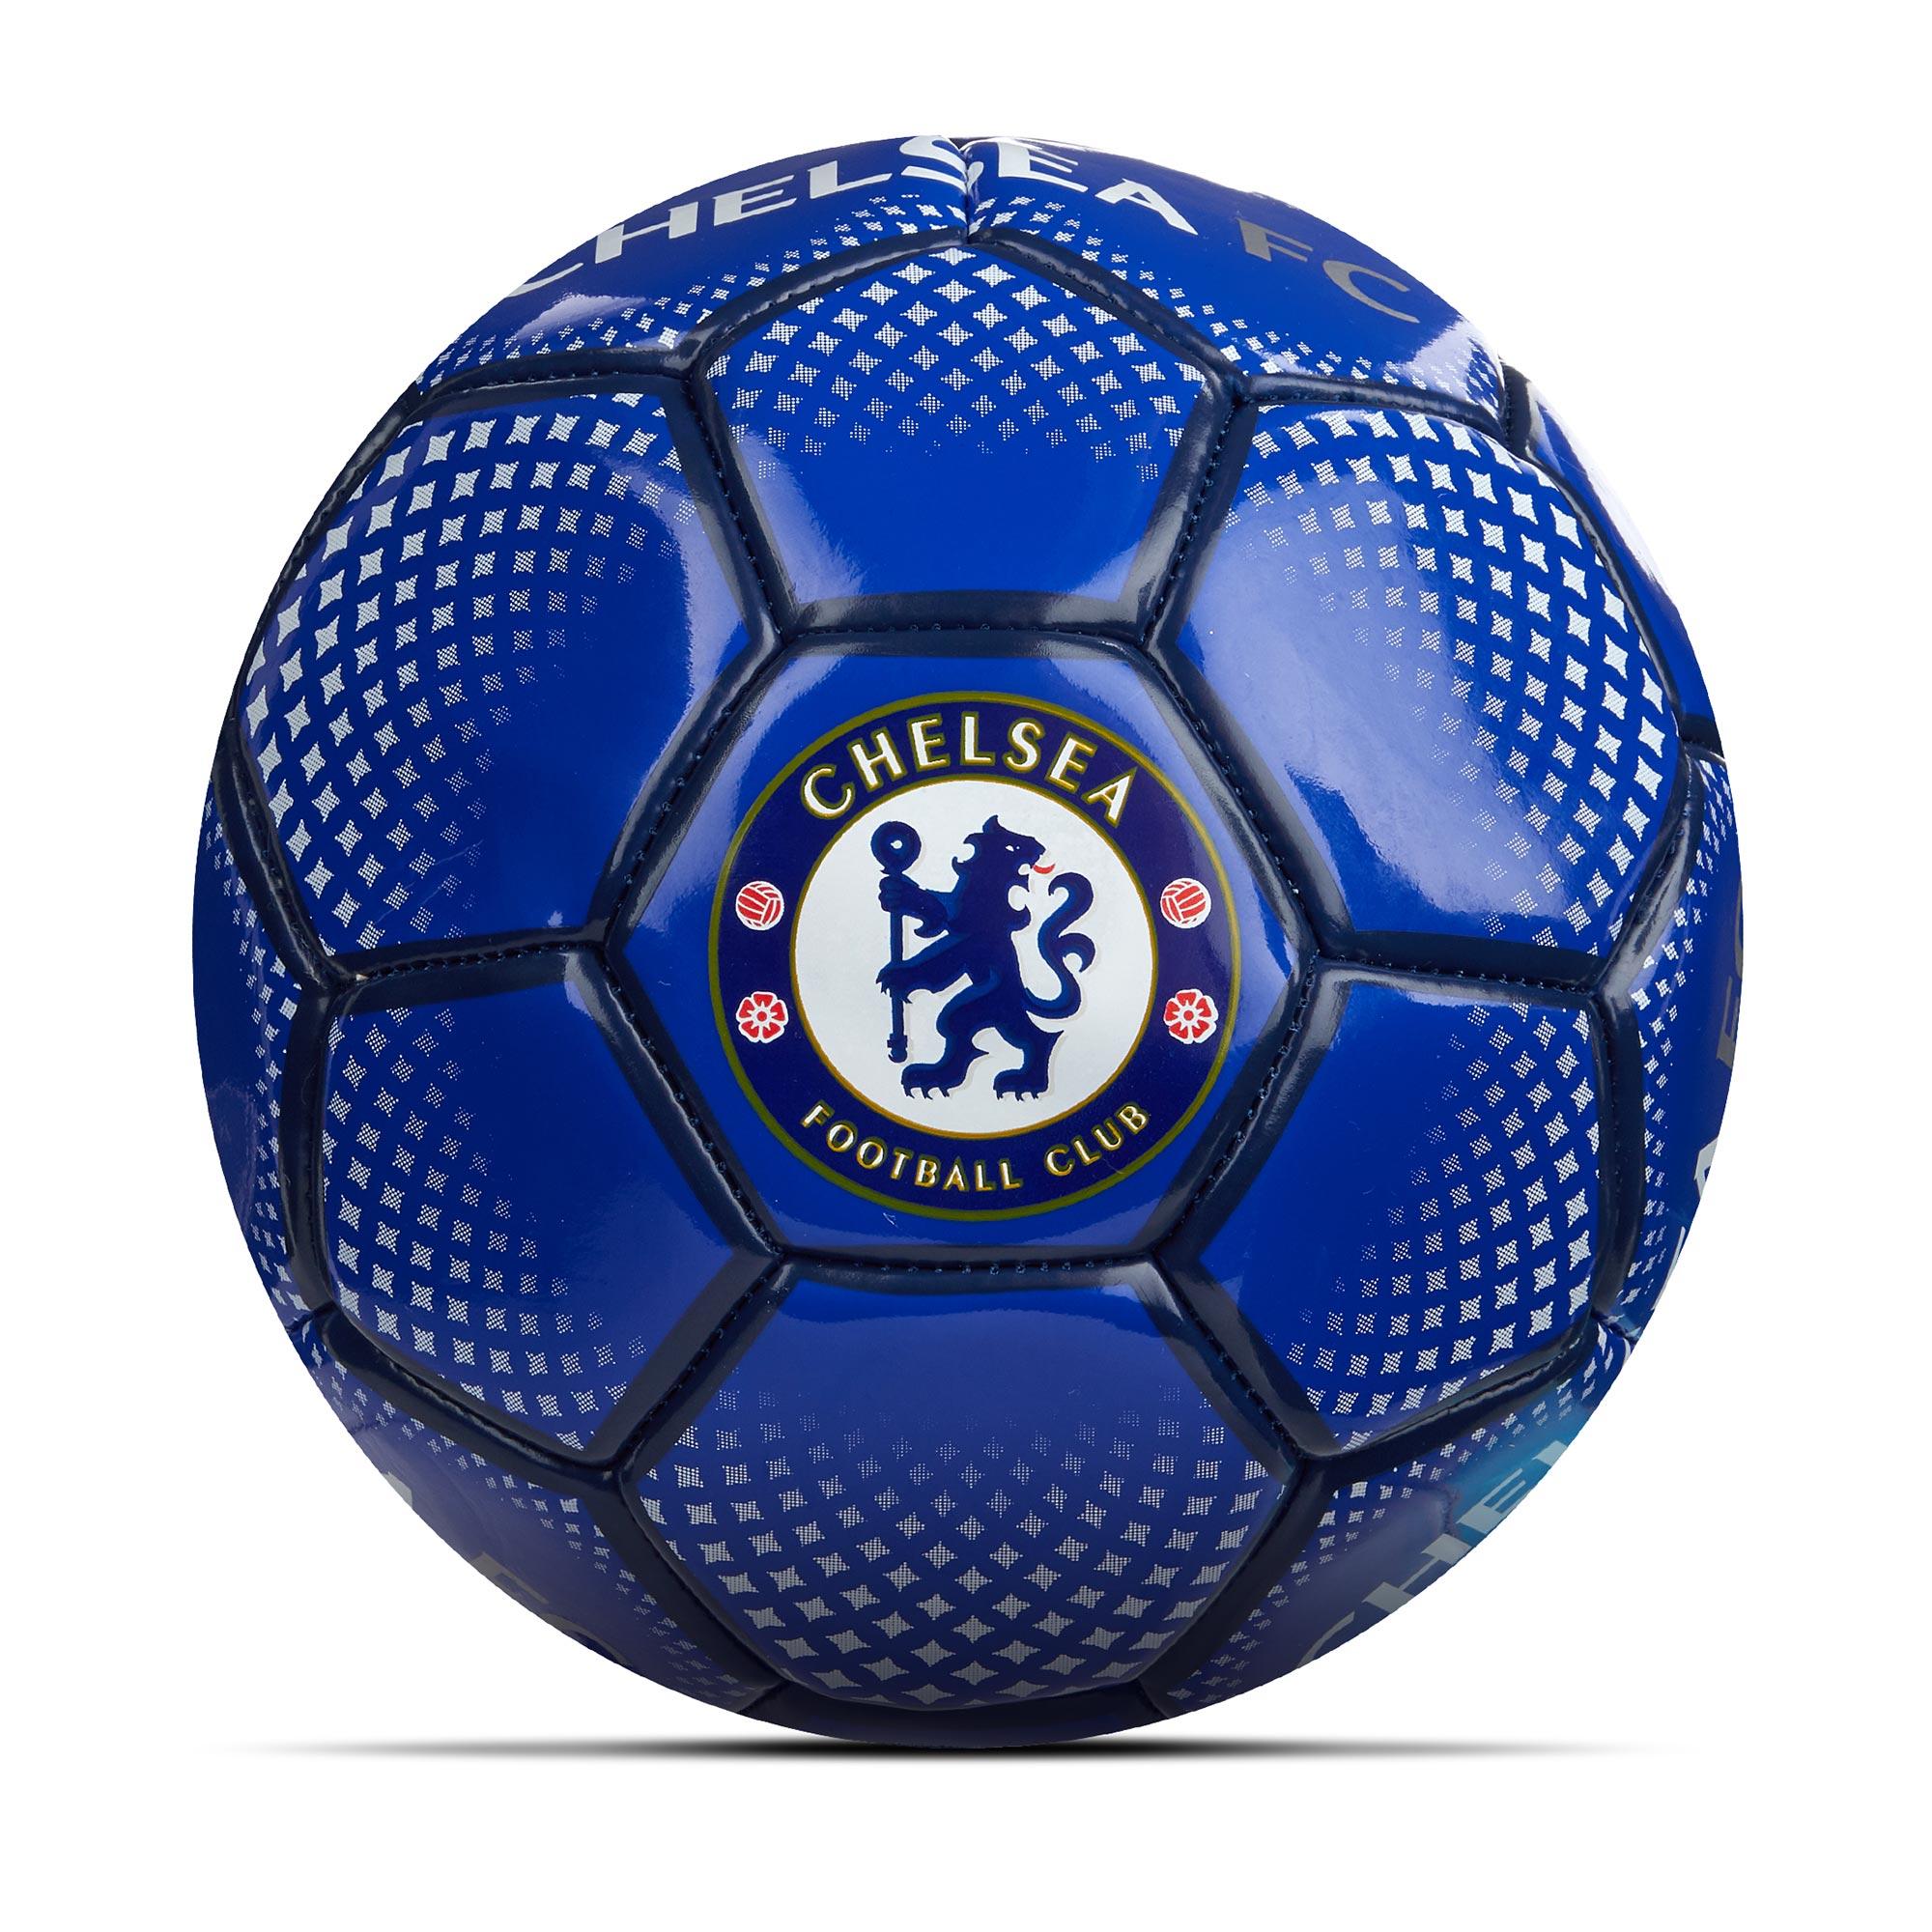 Balón de fútbol Diamond del Chelsea en azul en talla 5